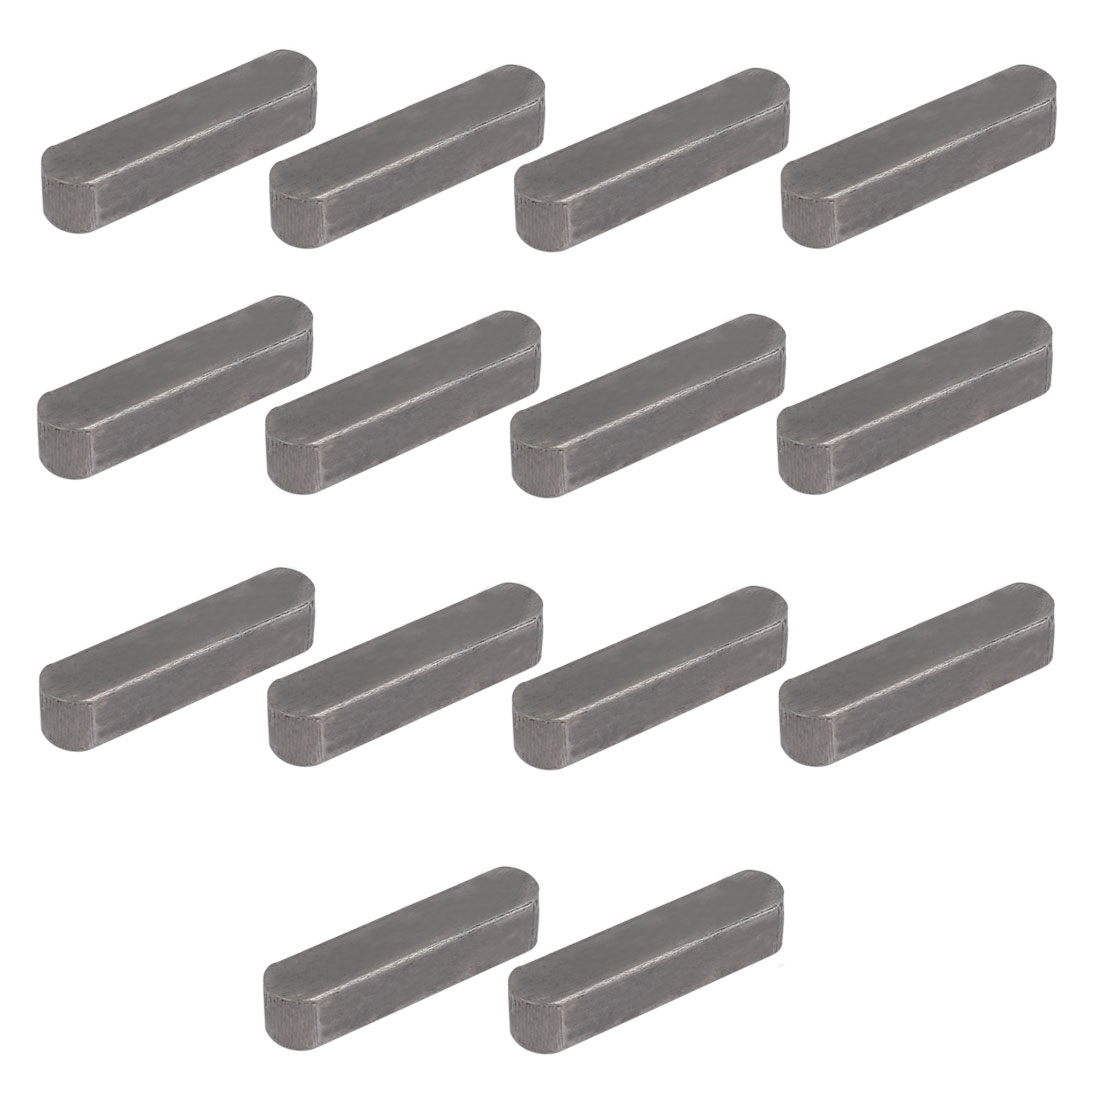 35mmx8mmx7mm Carbon Steel Key Stock To Lock Pulleys 14pcs